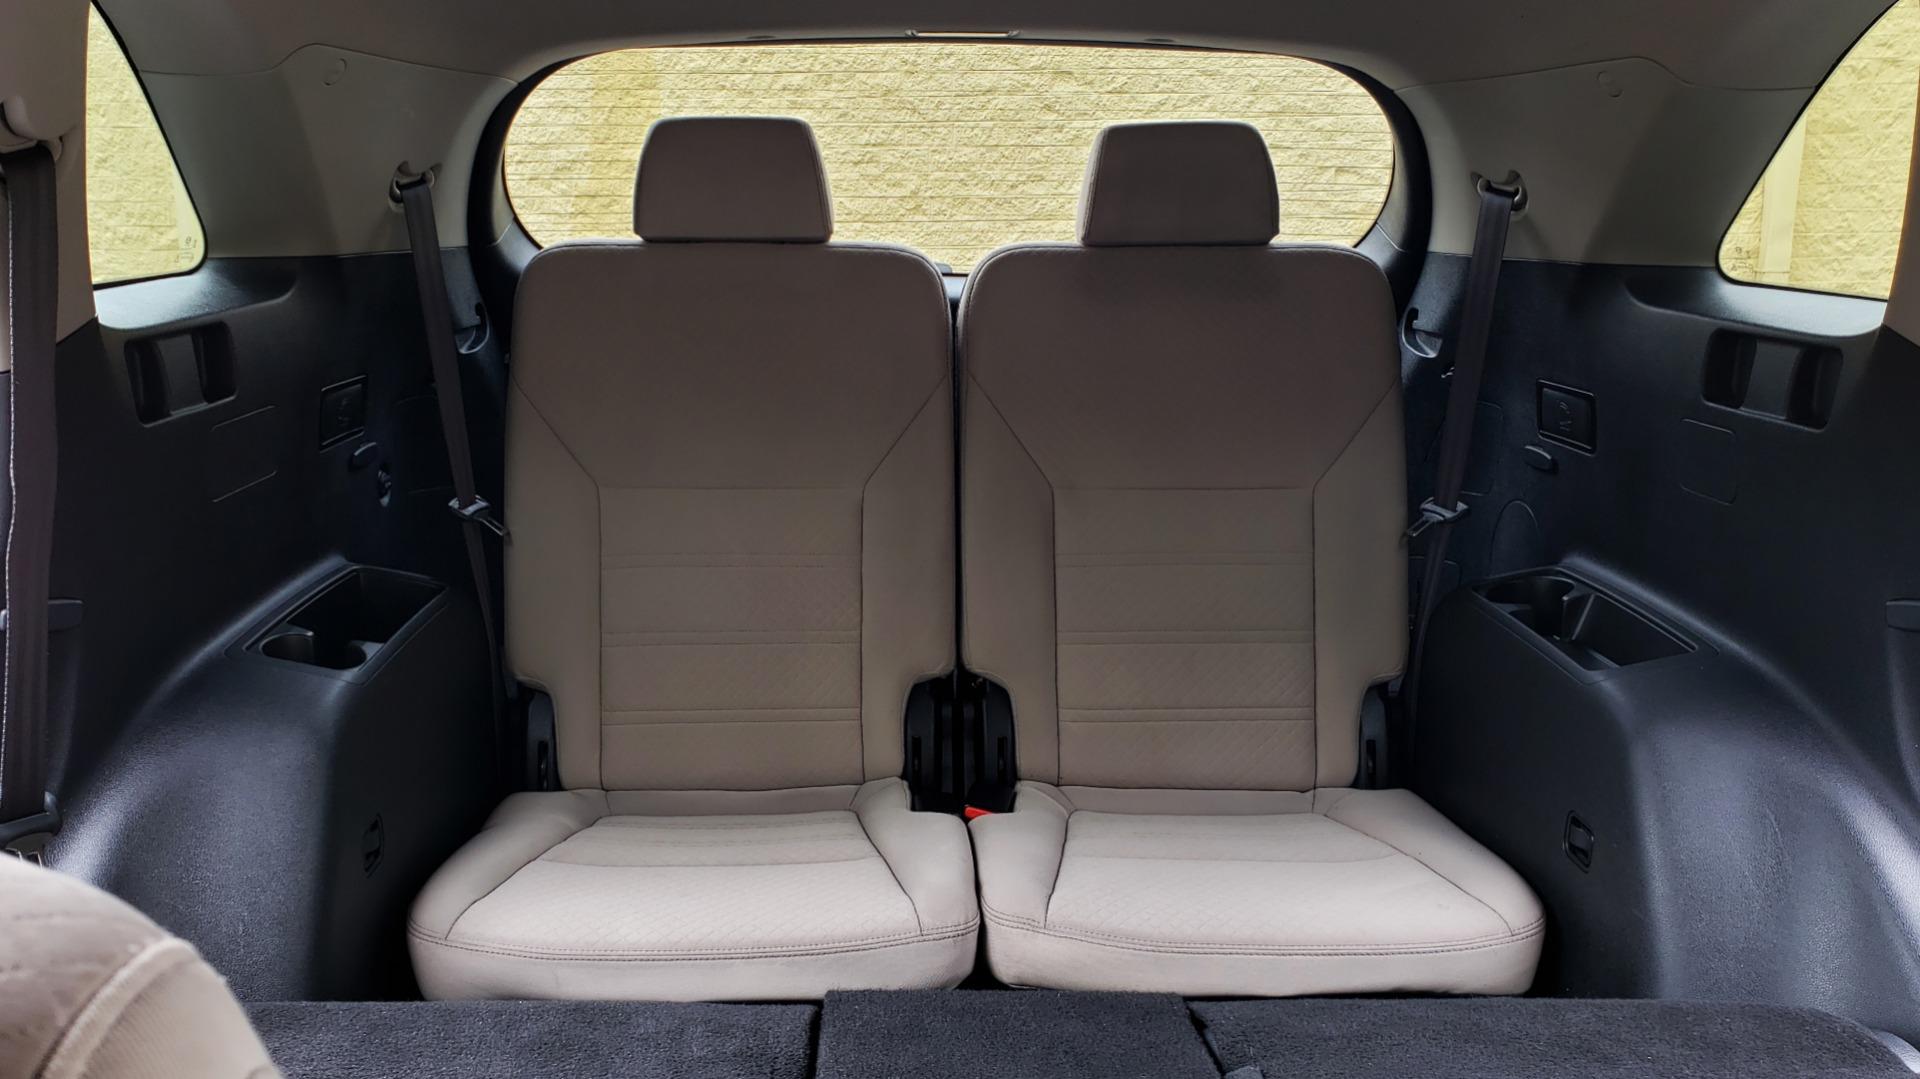 Used 2017 Kia SORENTO LX CONV PKG / FWD / ADVANCED TECH / 3-ROW for sale Sold at Formula Imports in Charlotte NC 28227 65